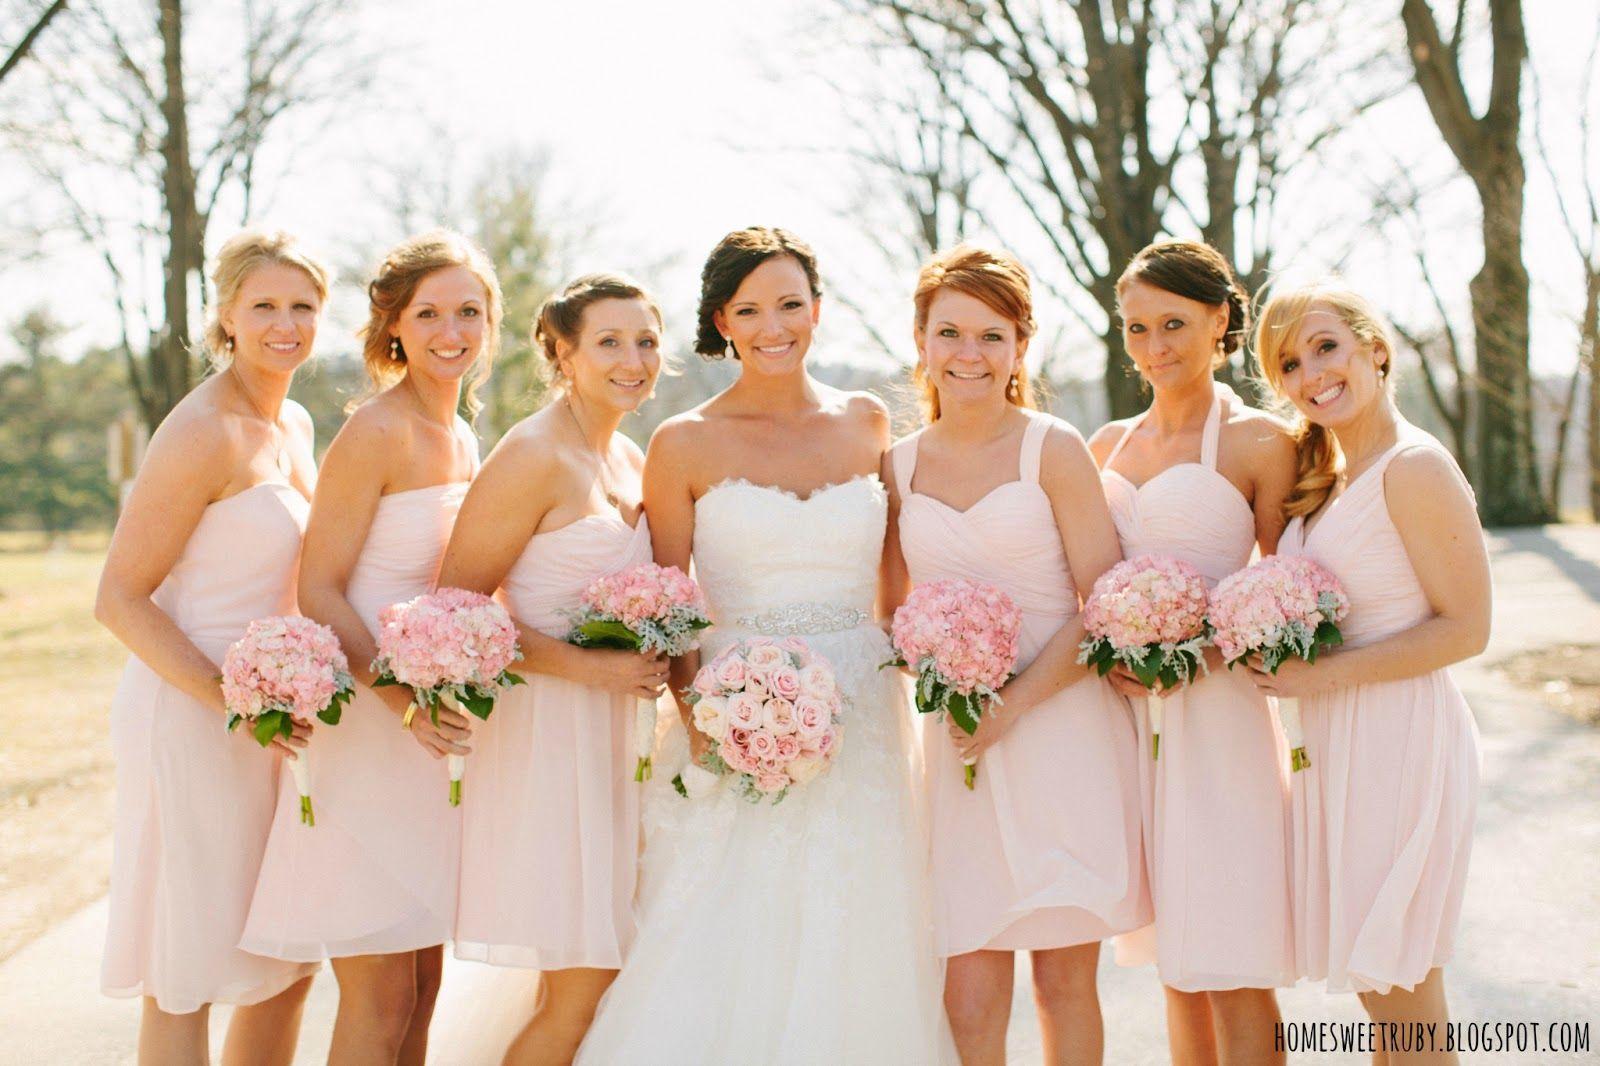 Bill levkoff chiffon bridesmaids dresses each a different style bill levkoff chiffon bridesmaids dresses each a different style hydrangea blush pink ombrellifo Images